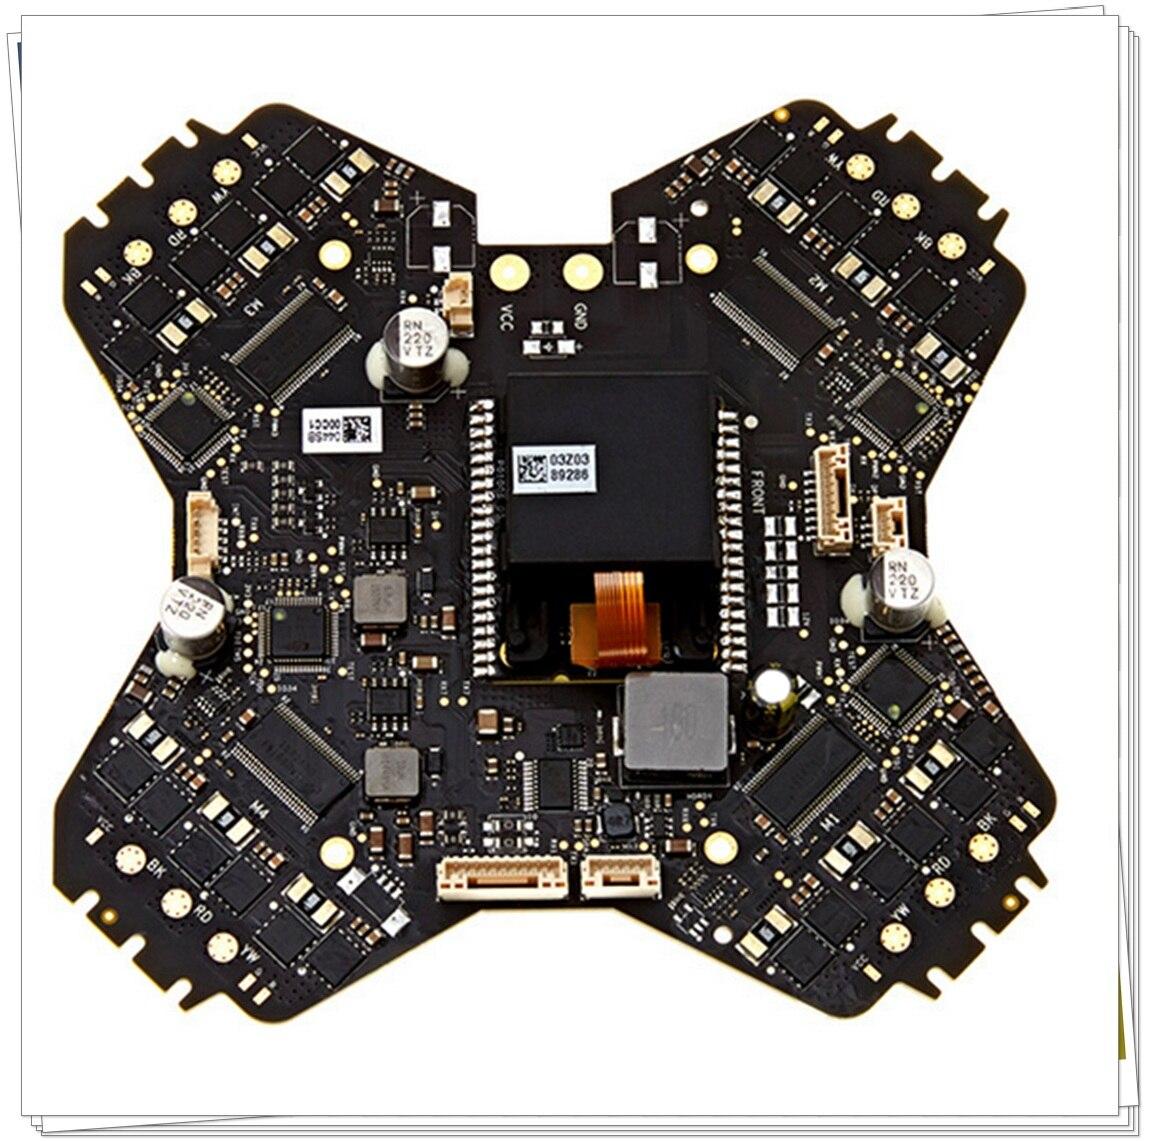 все цены на original 3AP ESC Center Board motherboard for DJI Phantom 3 Advanced / Professional drone repair Accessories